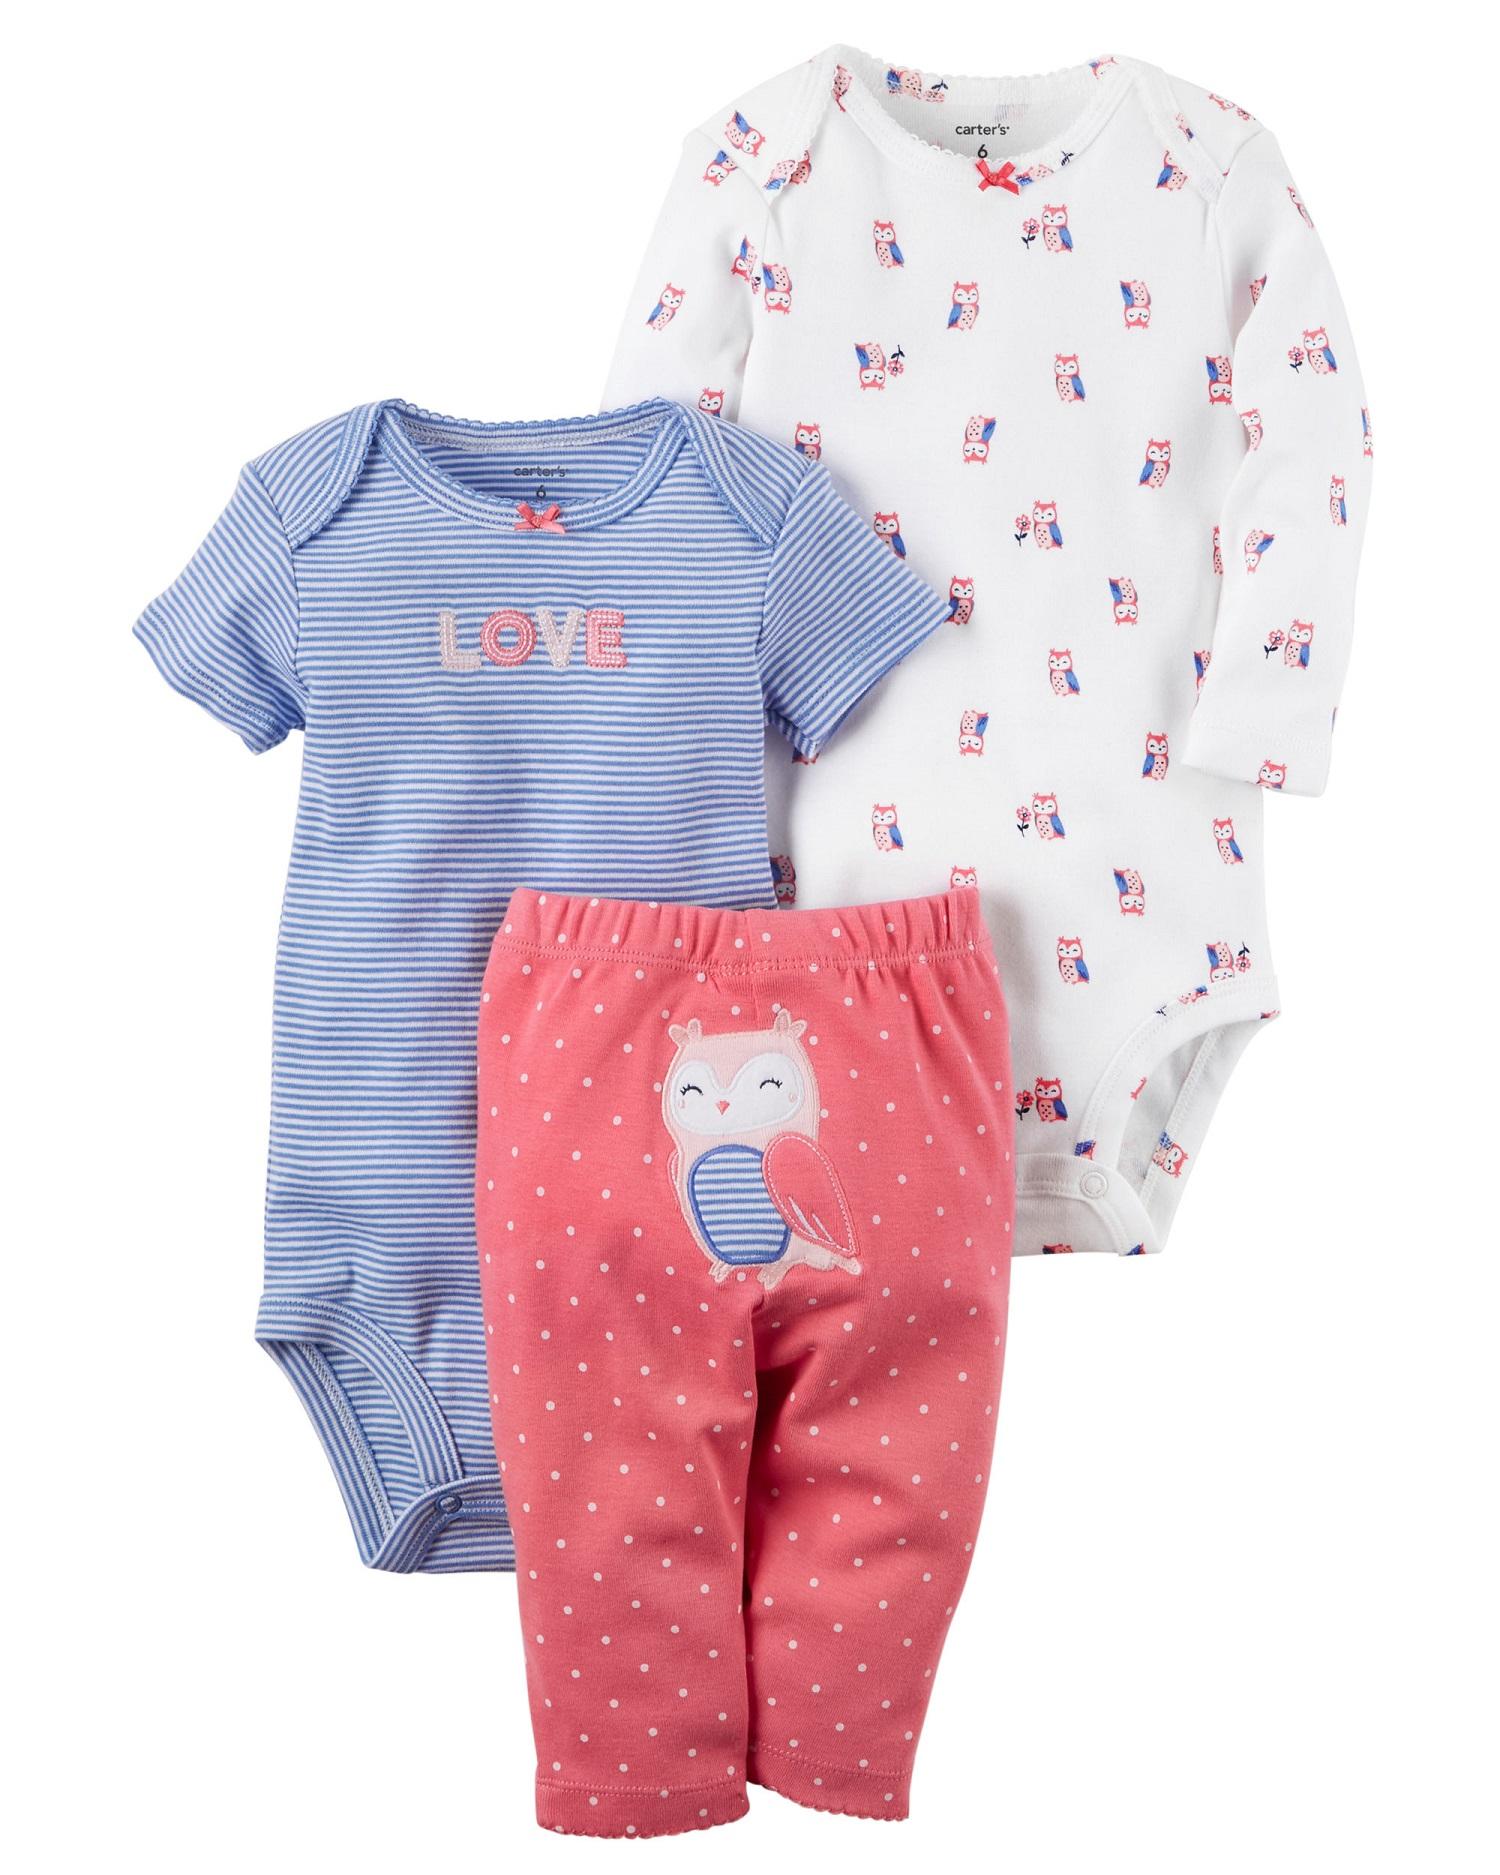 dbc7e38bff2f Carter's Baby Girls' 3-Piece Little Character Set, 3 Months ...